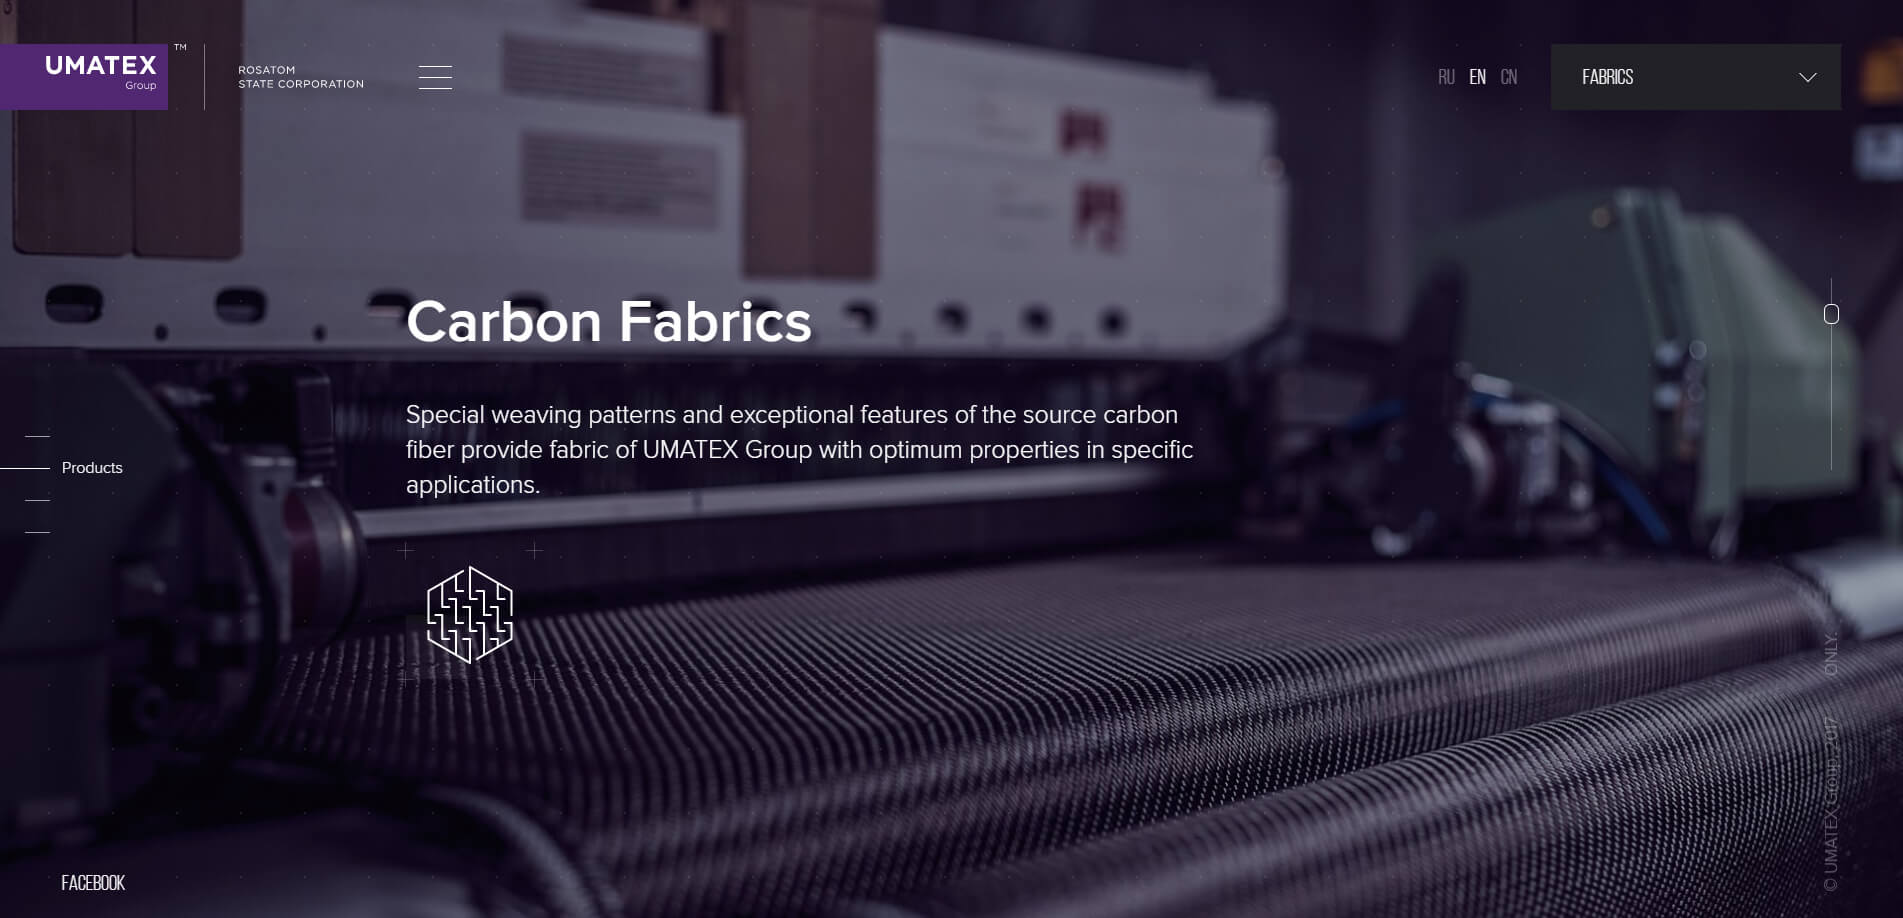 carbon-fabrics